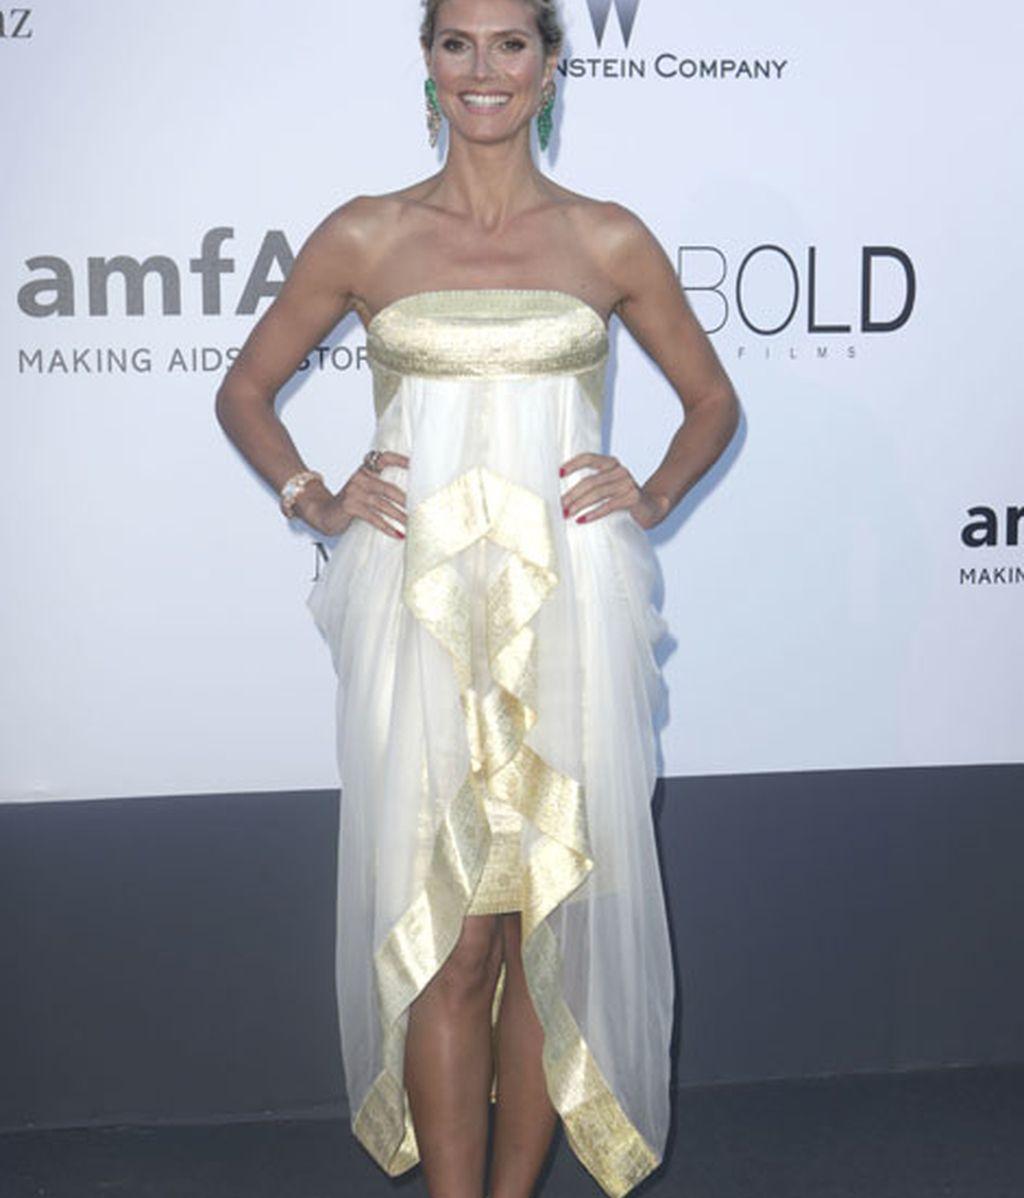 La modelo Heidi Klum, con un vestido palabra de honor de corte asimétrico